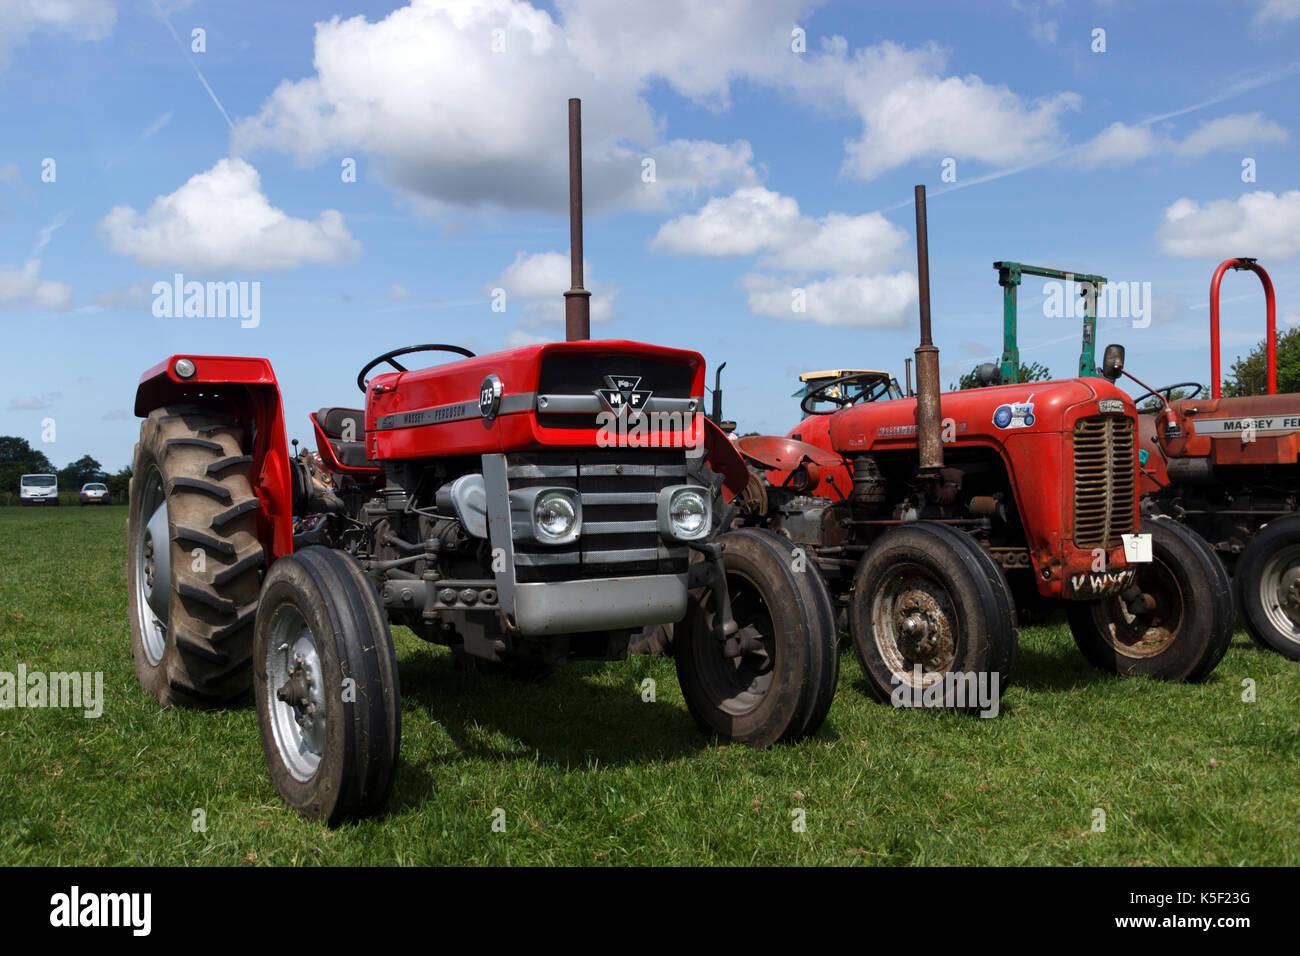 massey ferguson 135 tractor stock photos massey ferguson. Black Bedroom Furniture Sets. Home Design Ideas